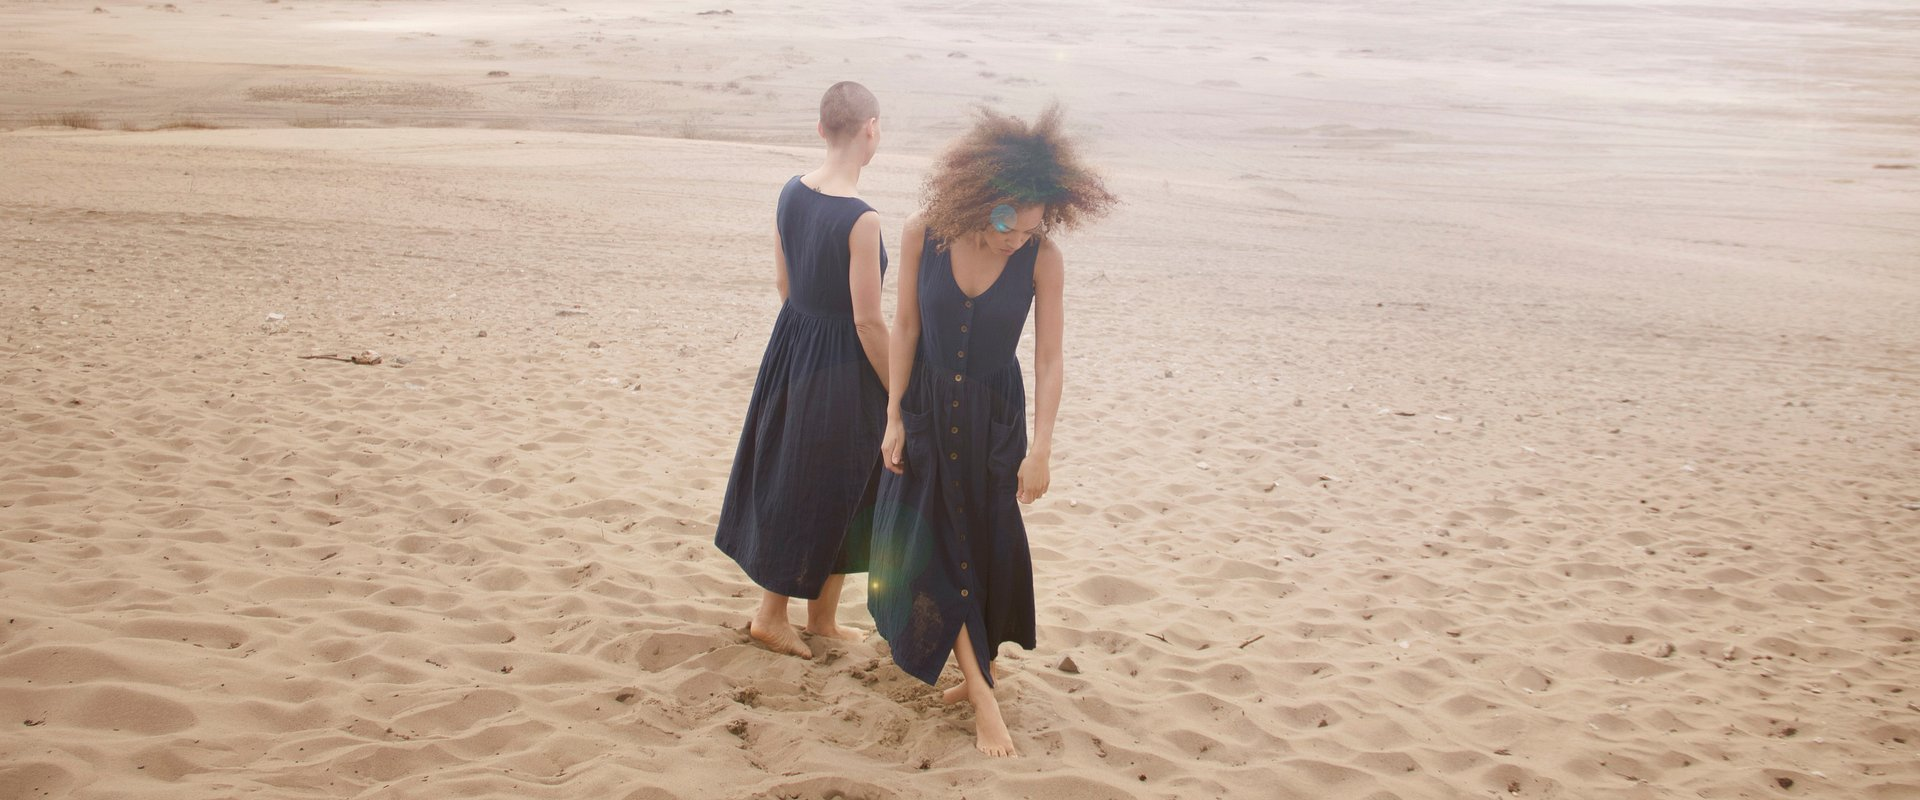 Desert breeze - najnowszy lookbook KOKOworld